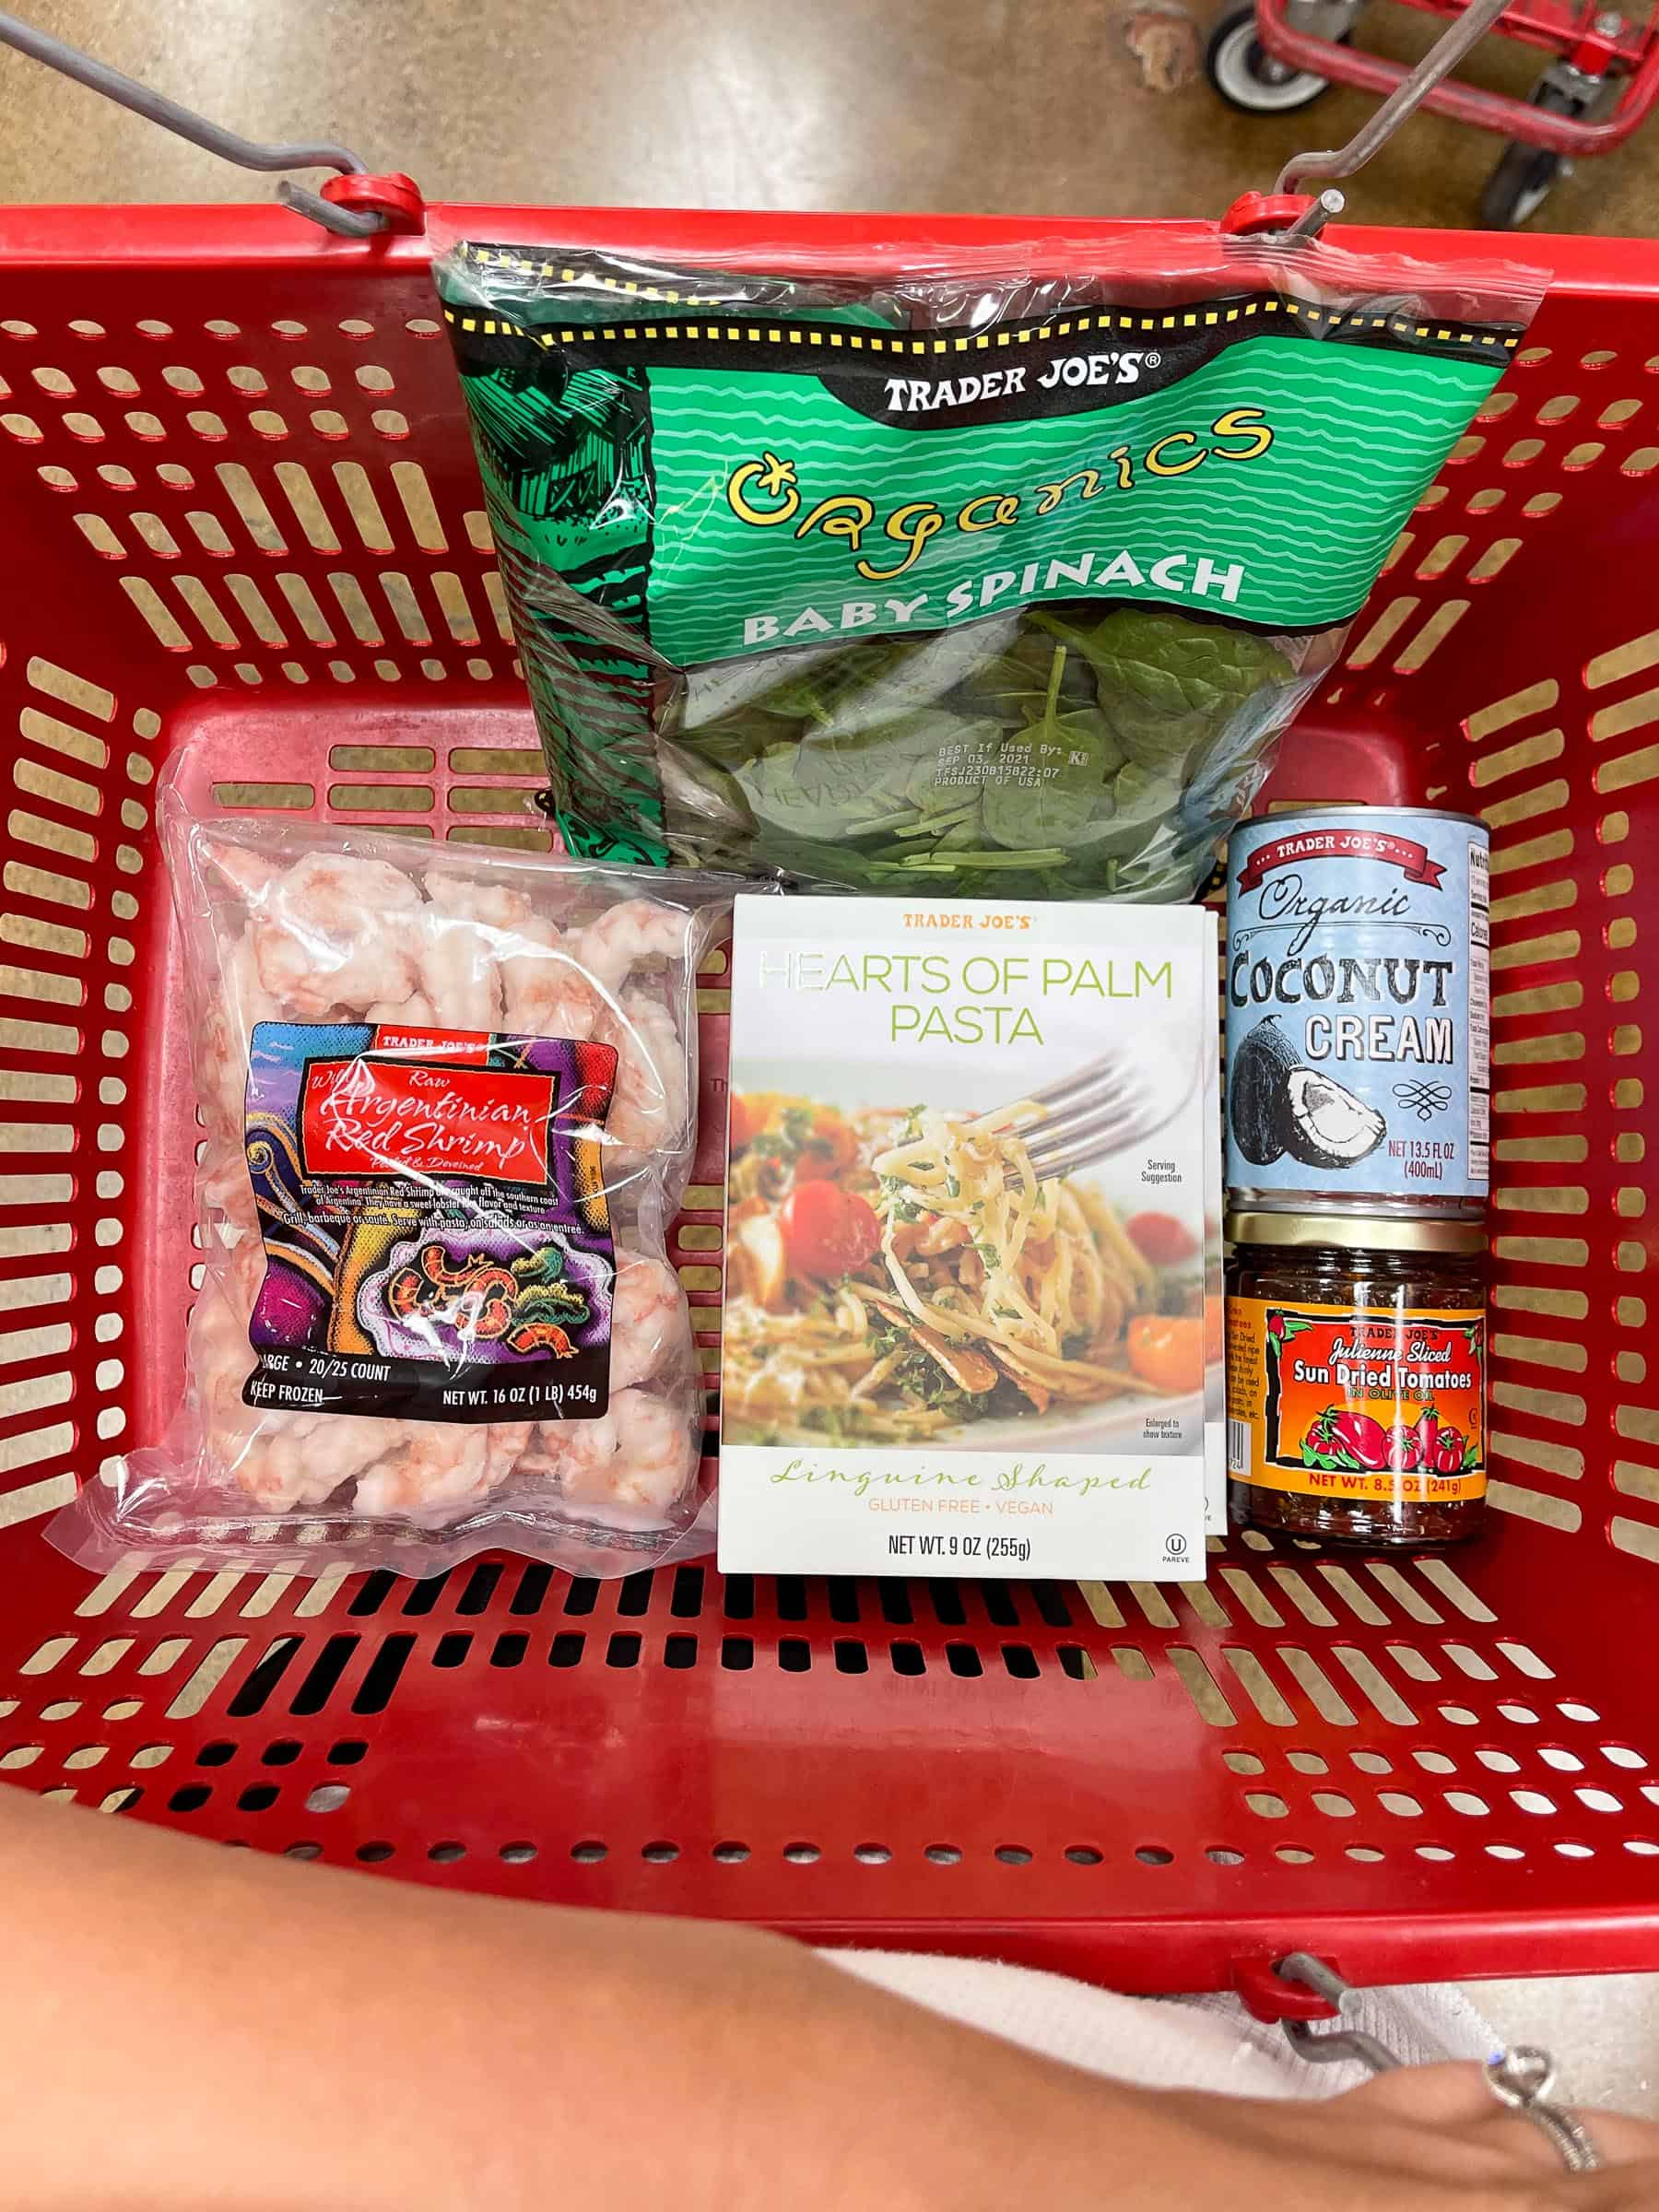 ingredients for keto creamy tuscan shrimp pasta in a red trader joe's basket